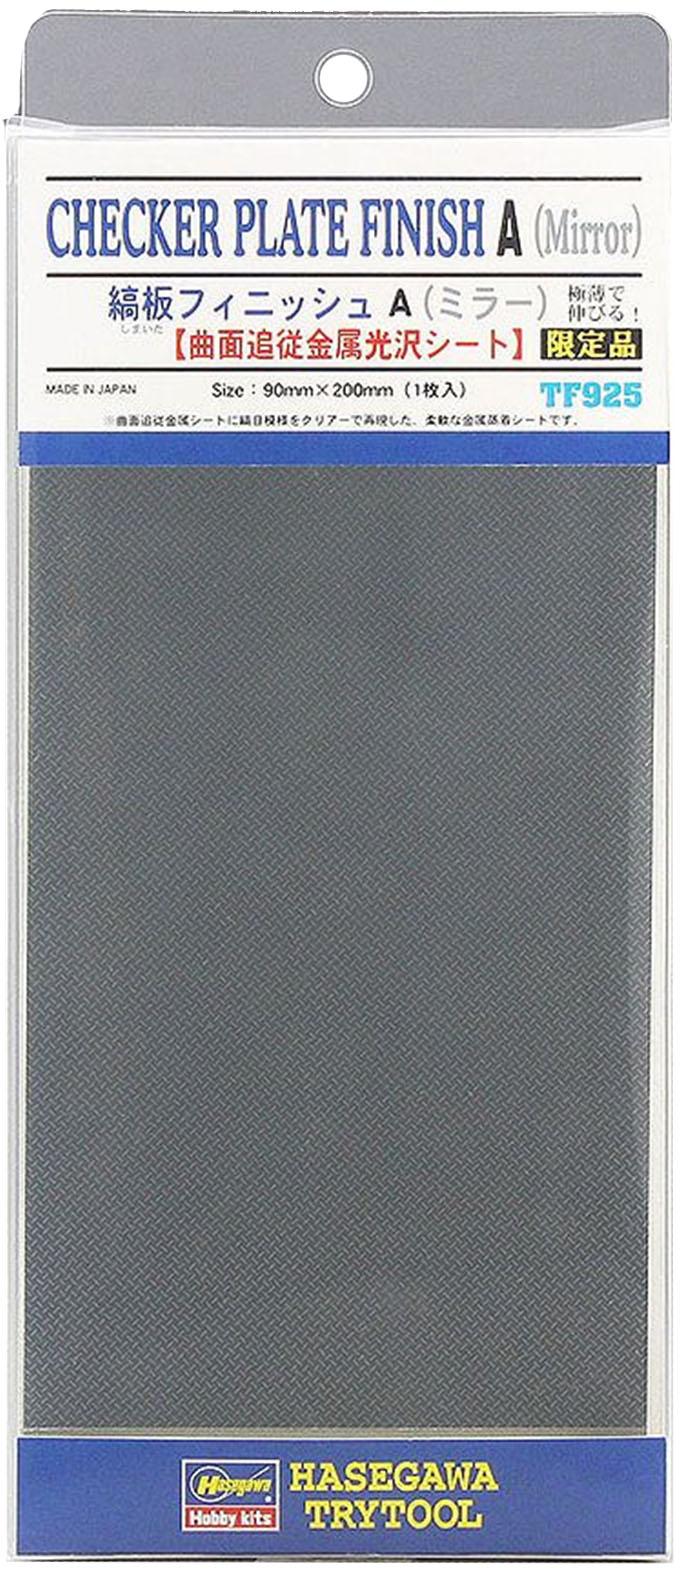 TF925  縞板フィニッシュ A(ミラー) 【曲面追従金属光沢シート】